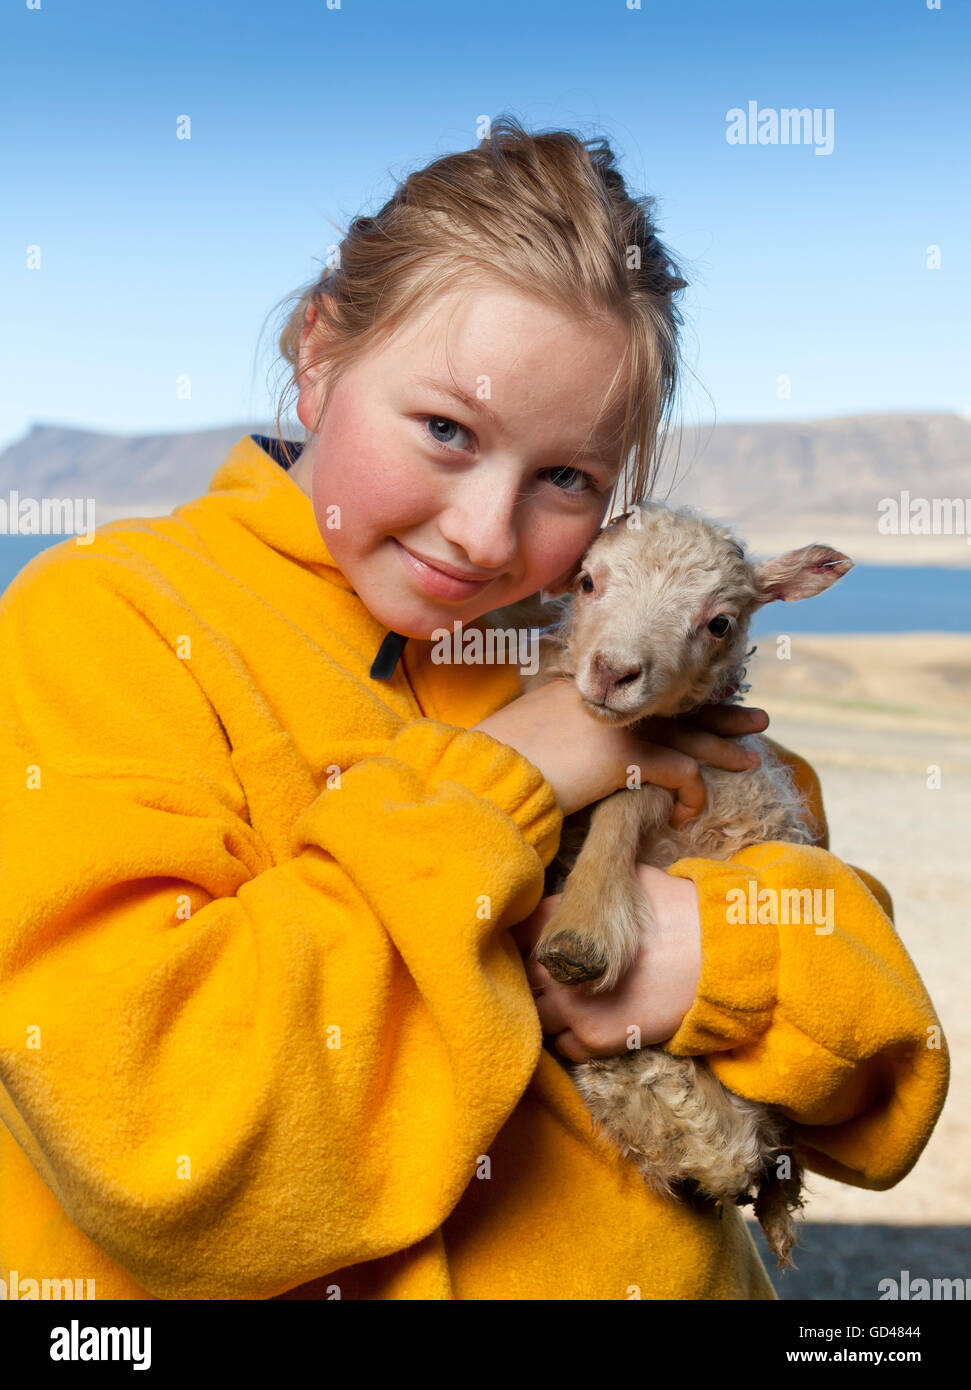 Girl holding a newborn lamb, Iceland - Stock Image